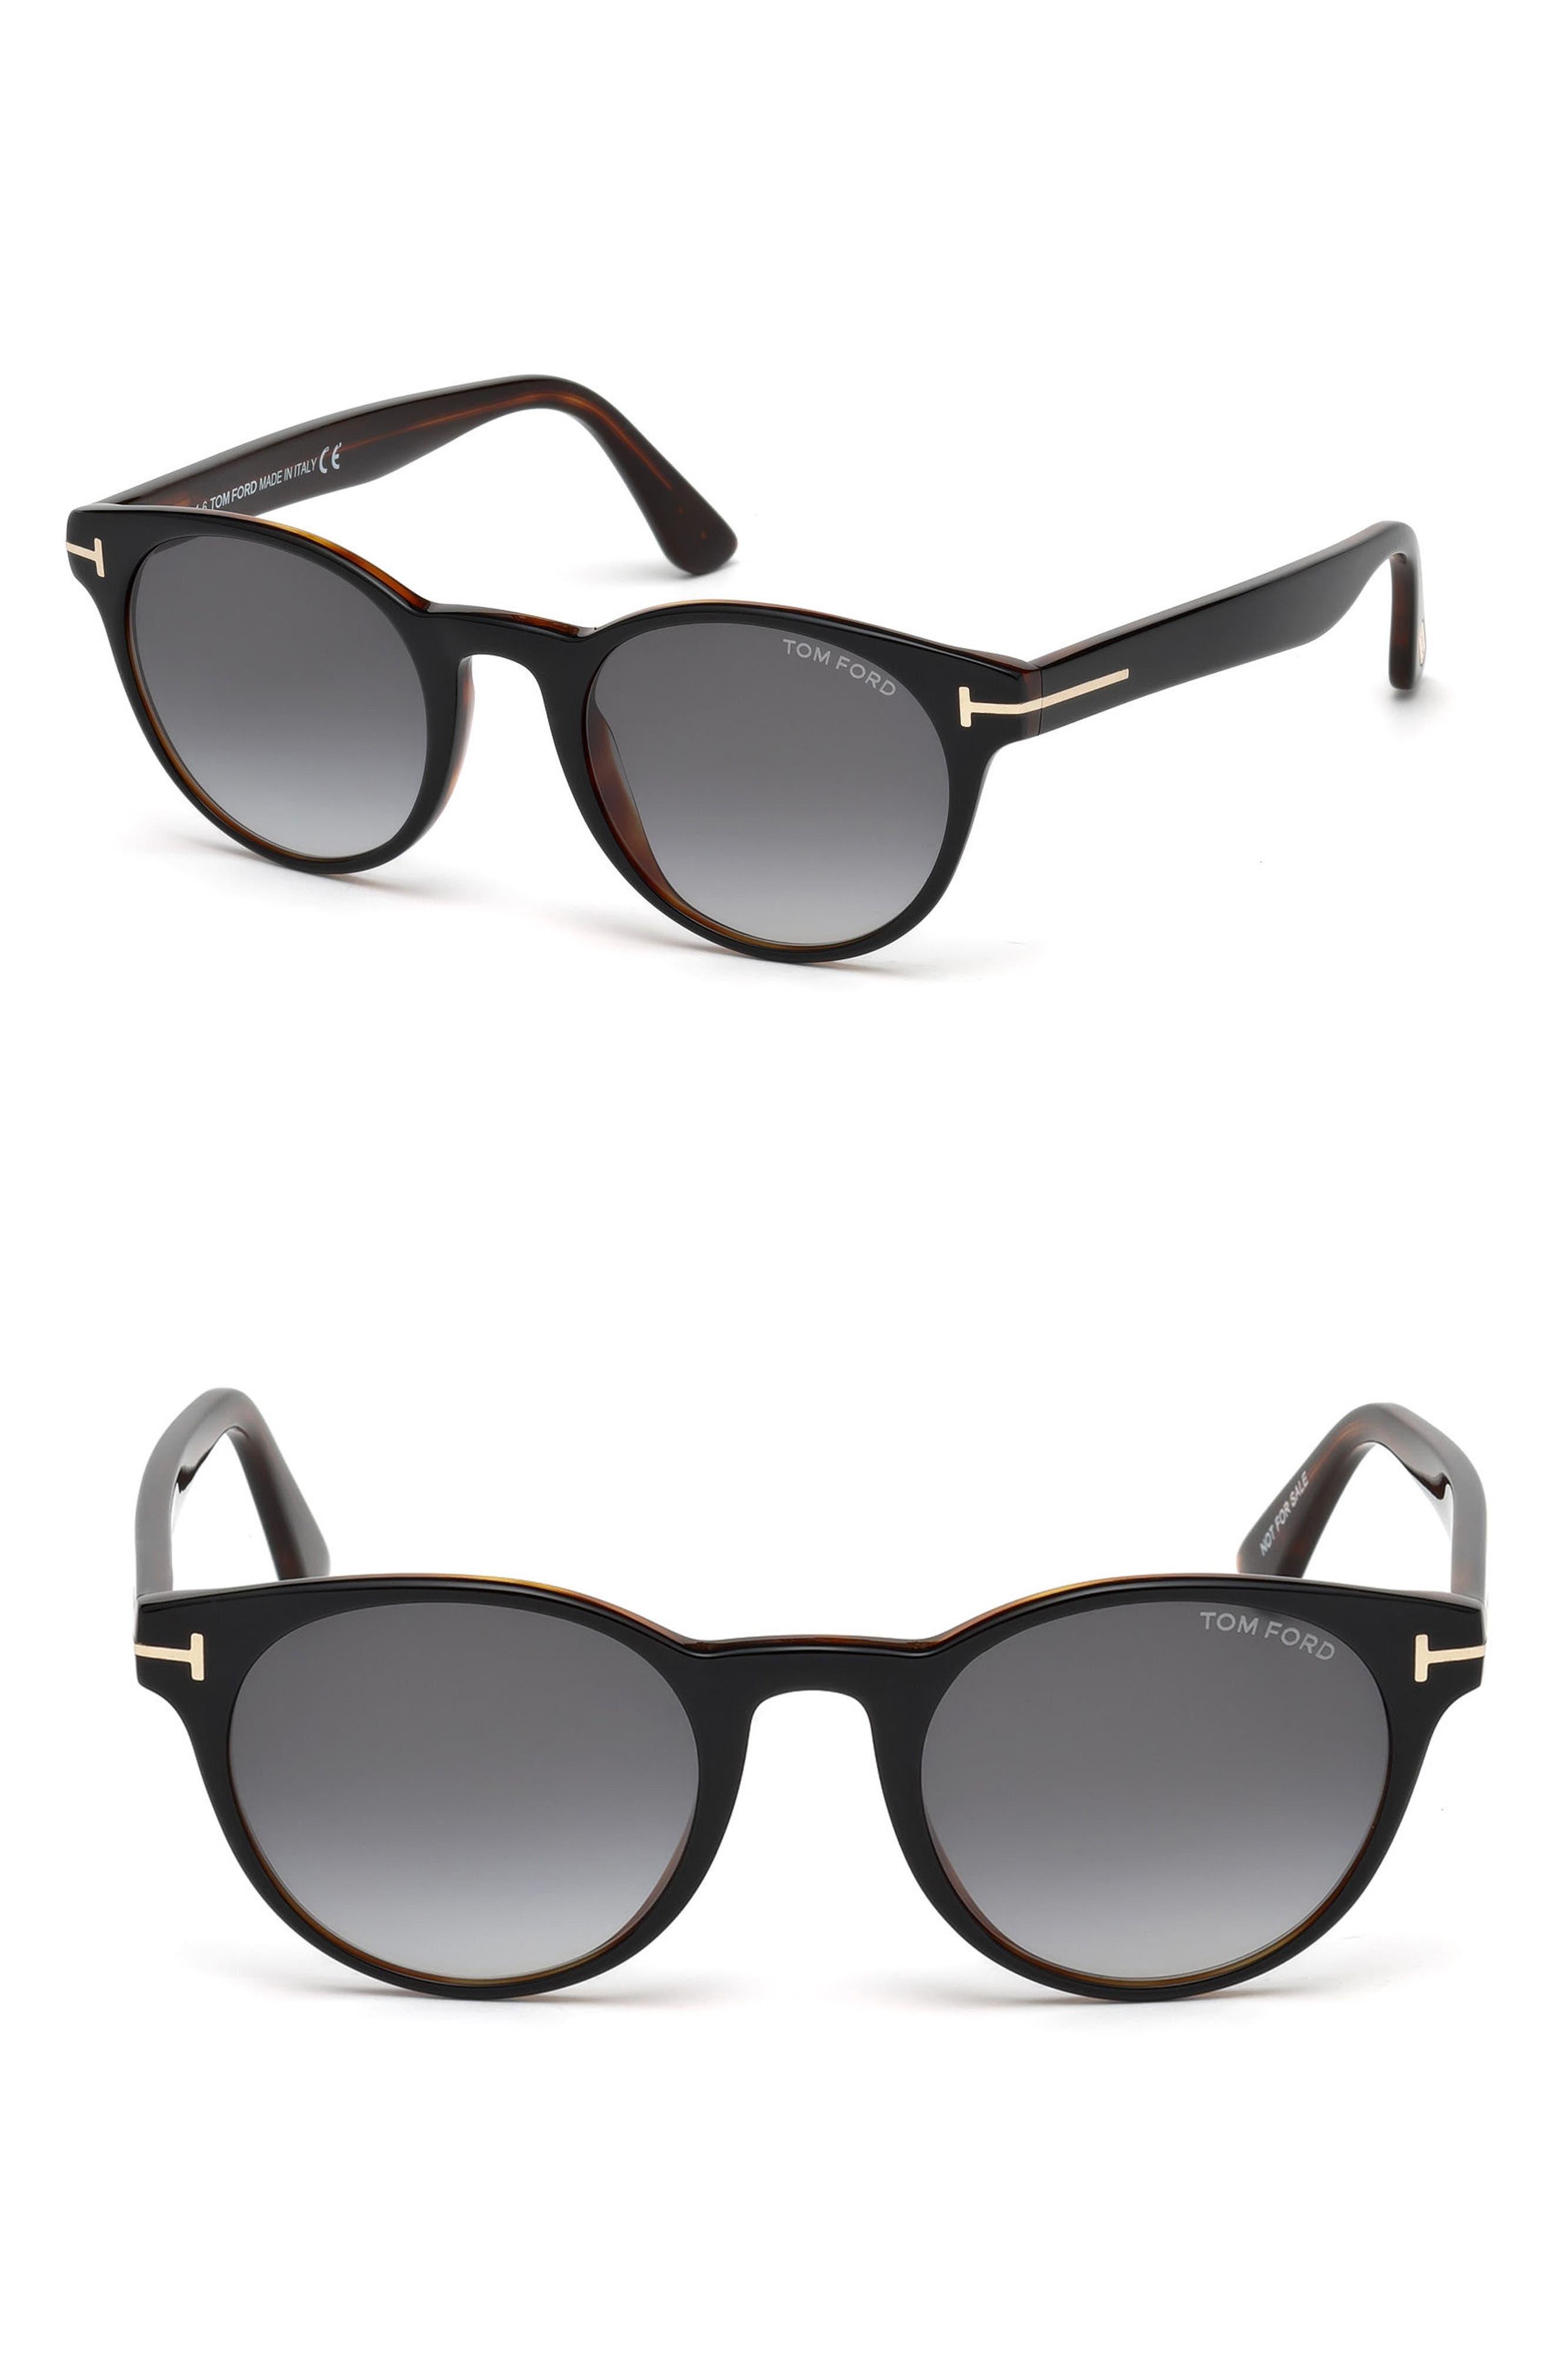 Palmer 51mm Polarized Sunglasses,                             Main thumbnail 1, color,                             017